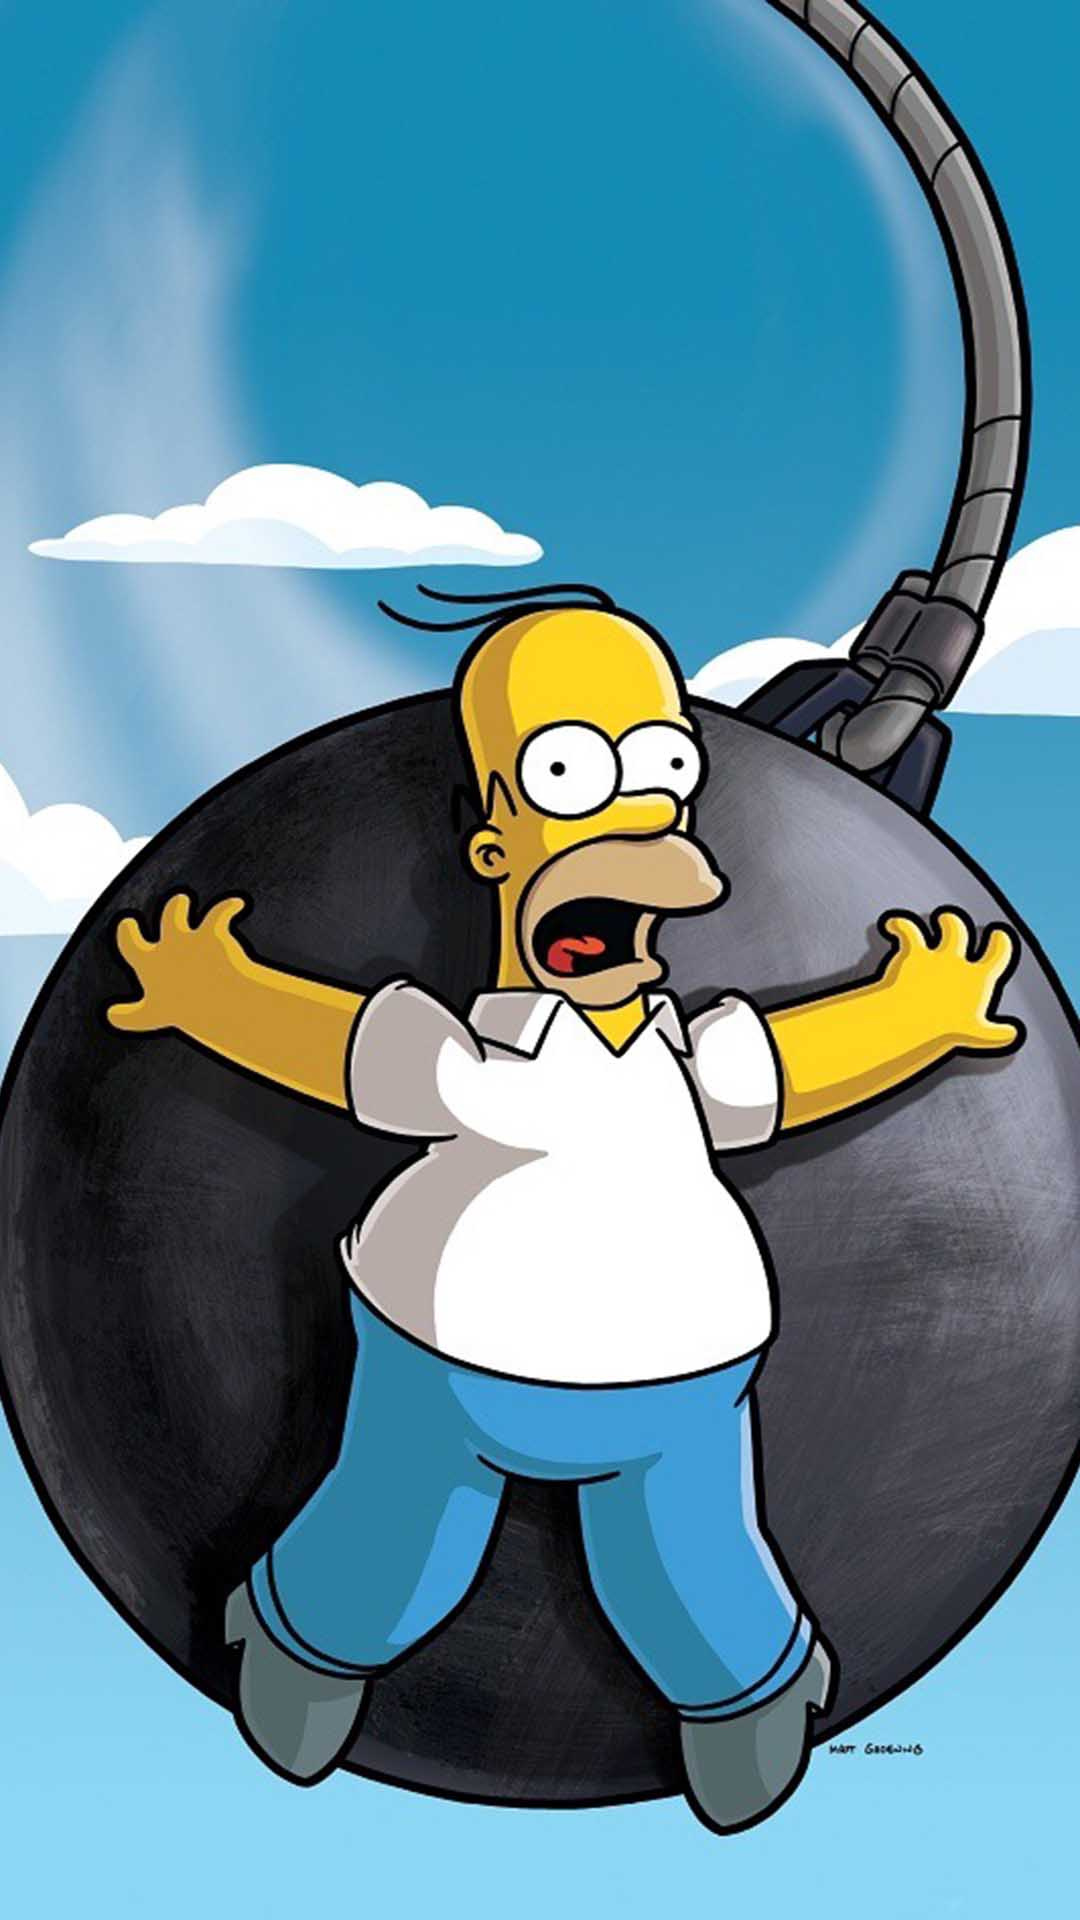 iPhone wallpaper homer simpson movie Homer Simpson